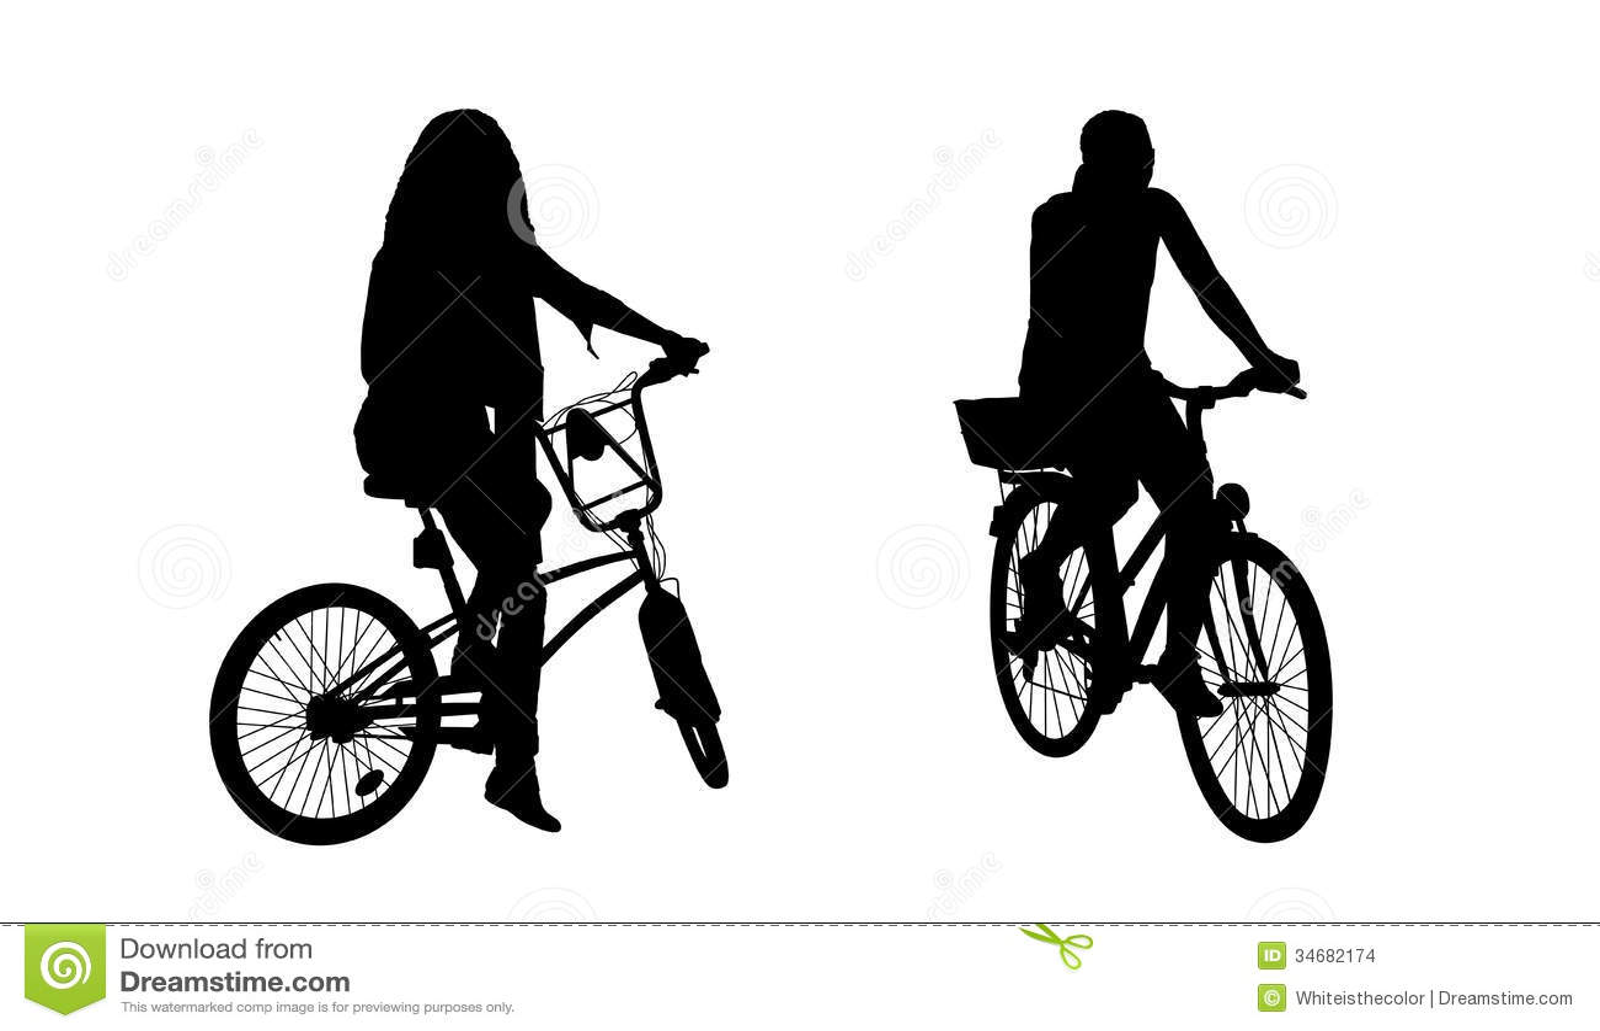 a personal story riding a bike